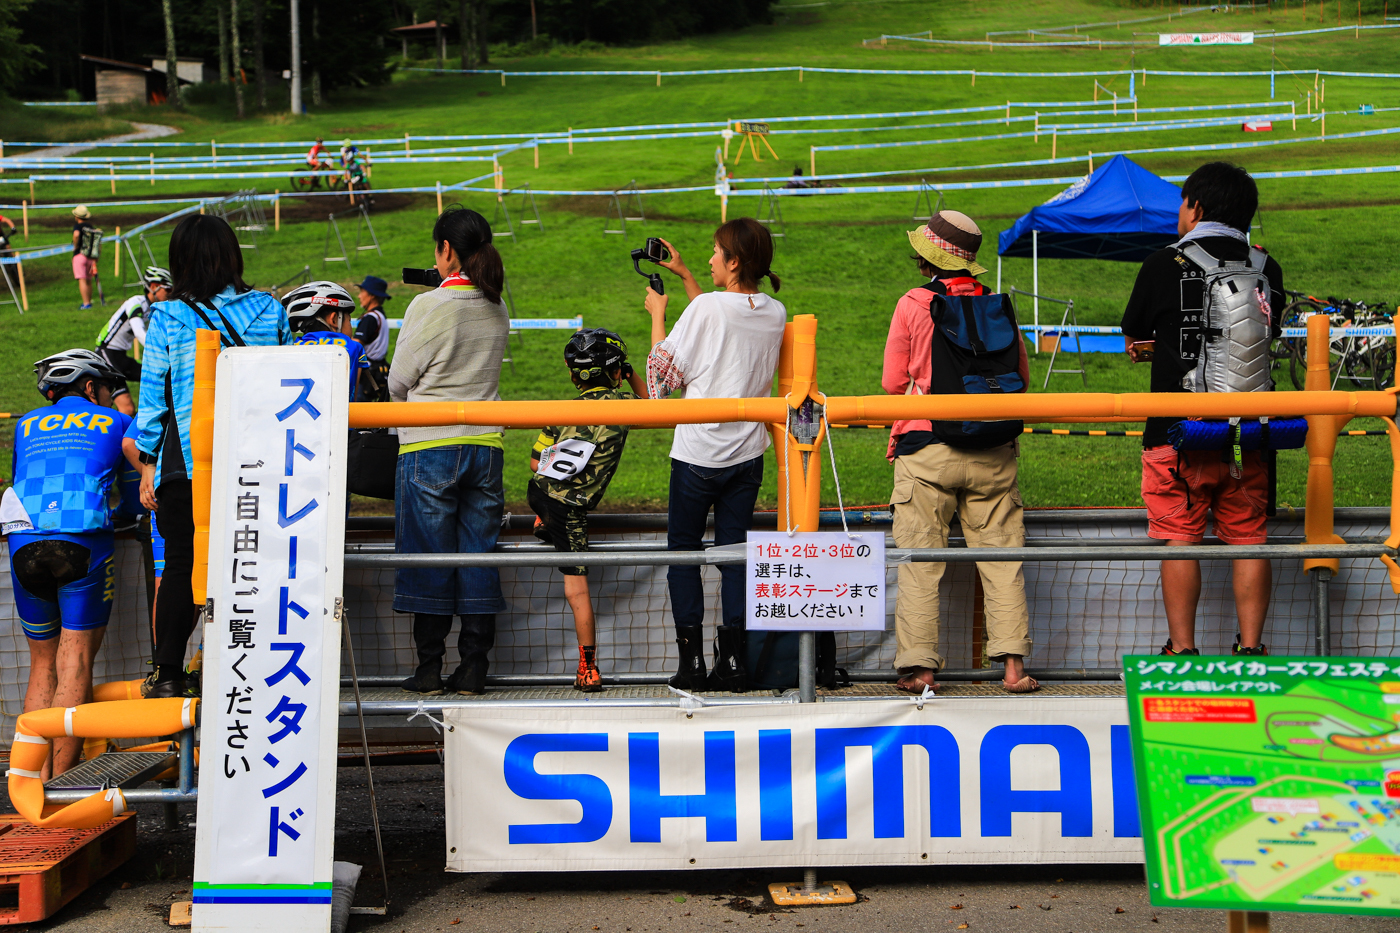 shimanobike-6.jpg